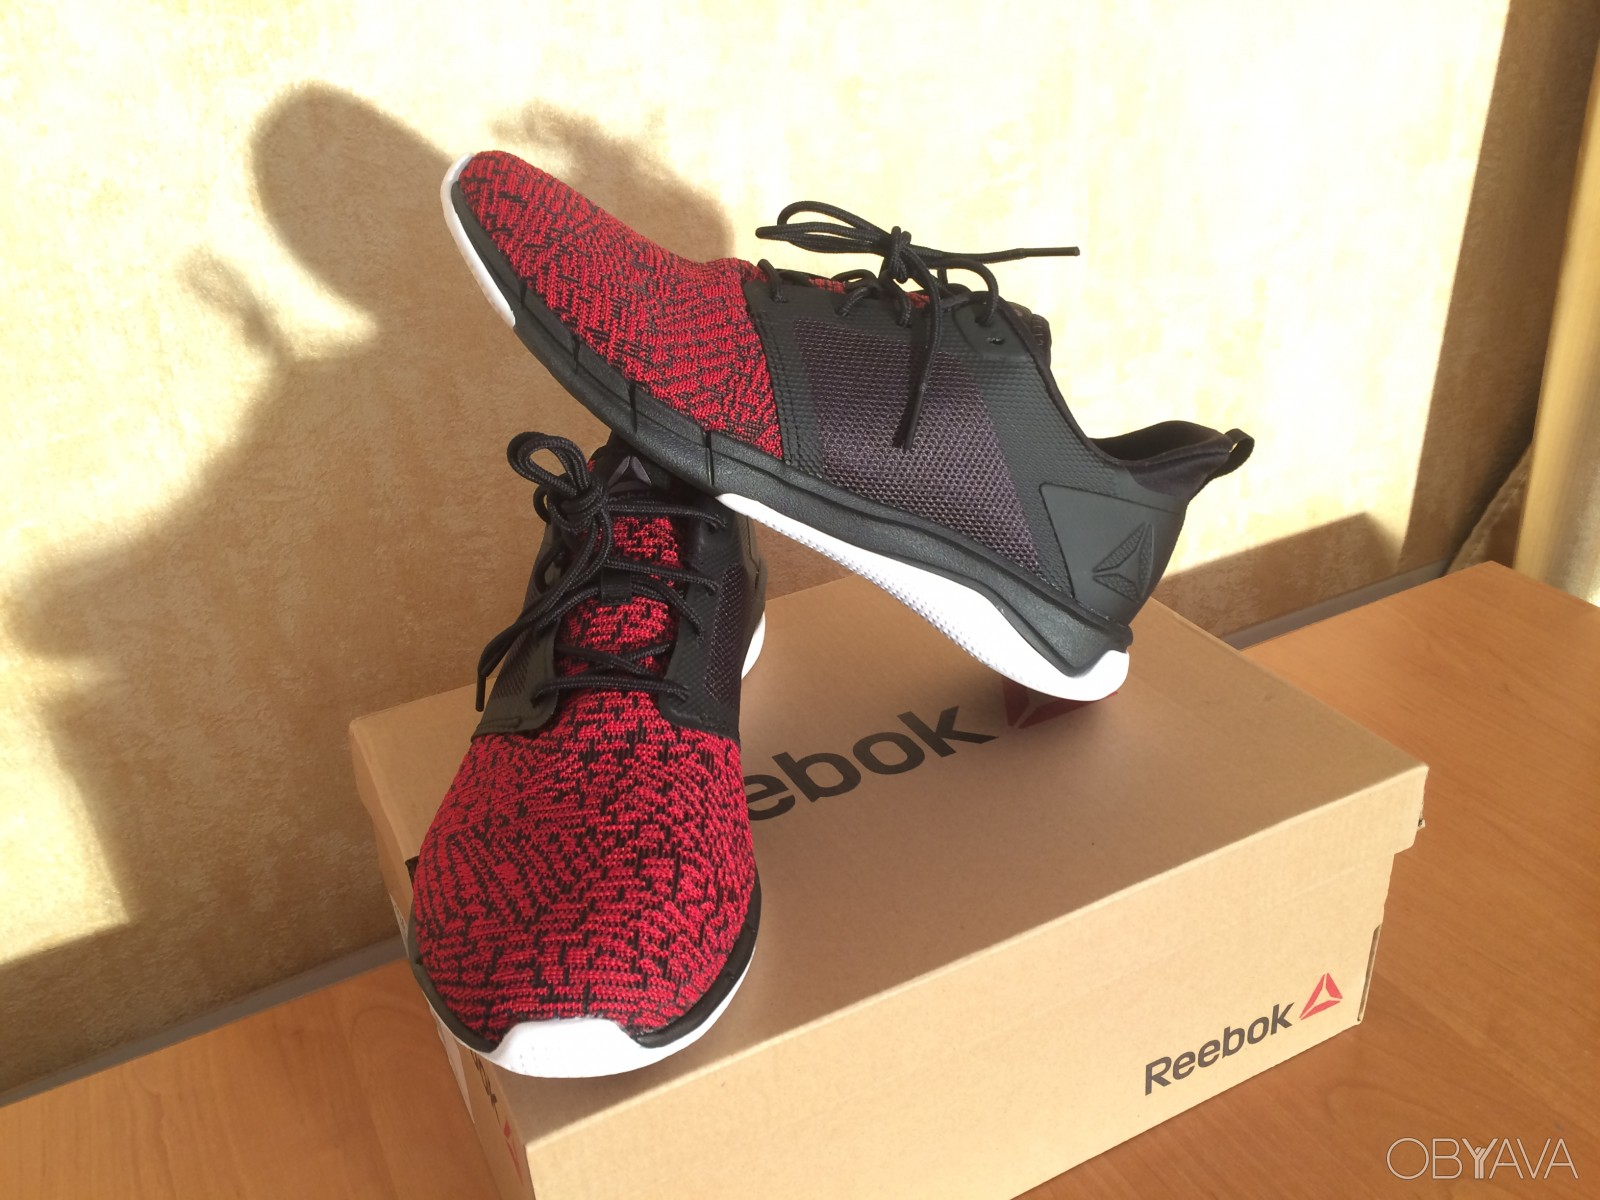 1f0946661fb4 Обувь Ахтырка – купить обувь на доске объявлений OBYAVA.ua